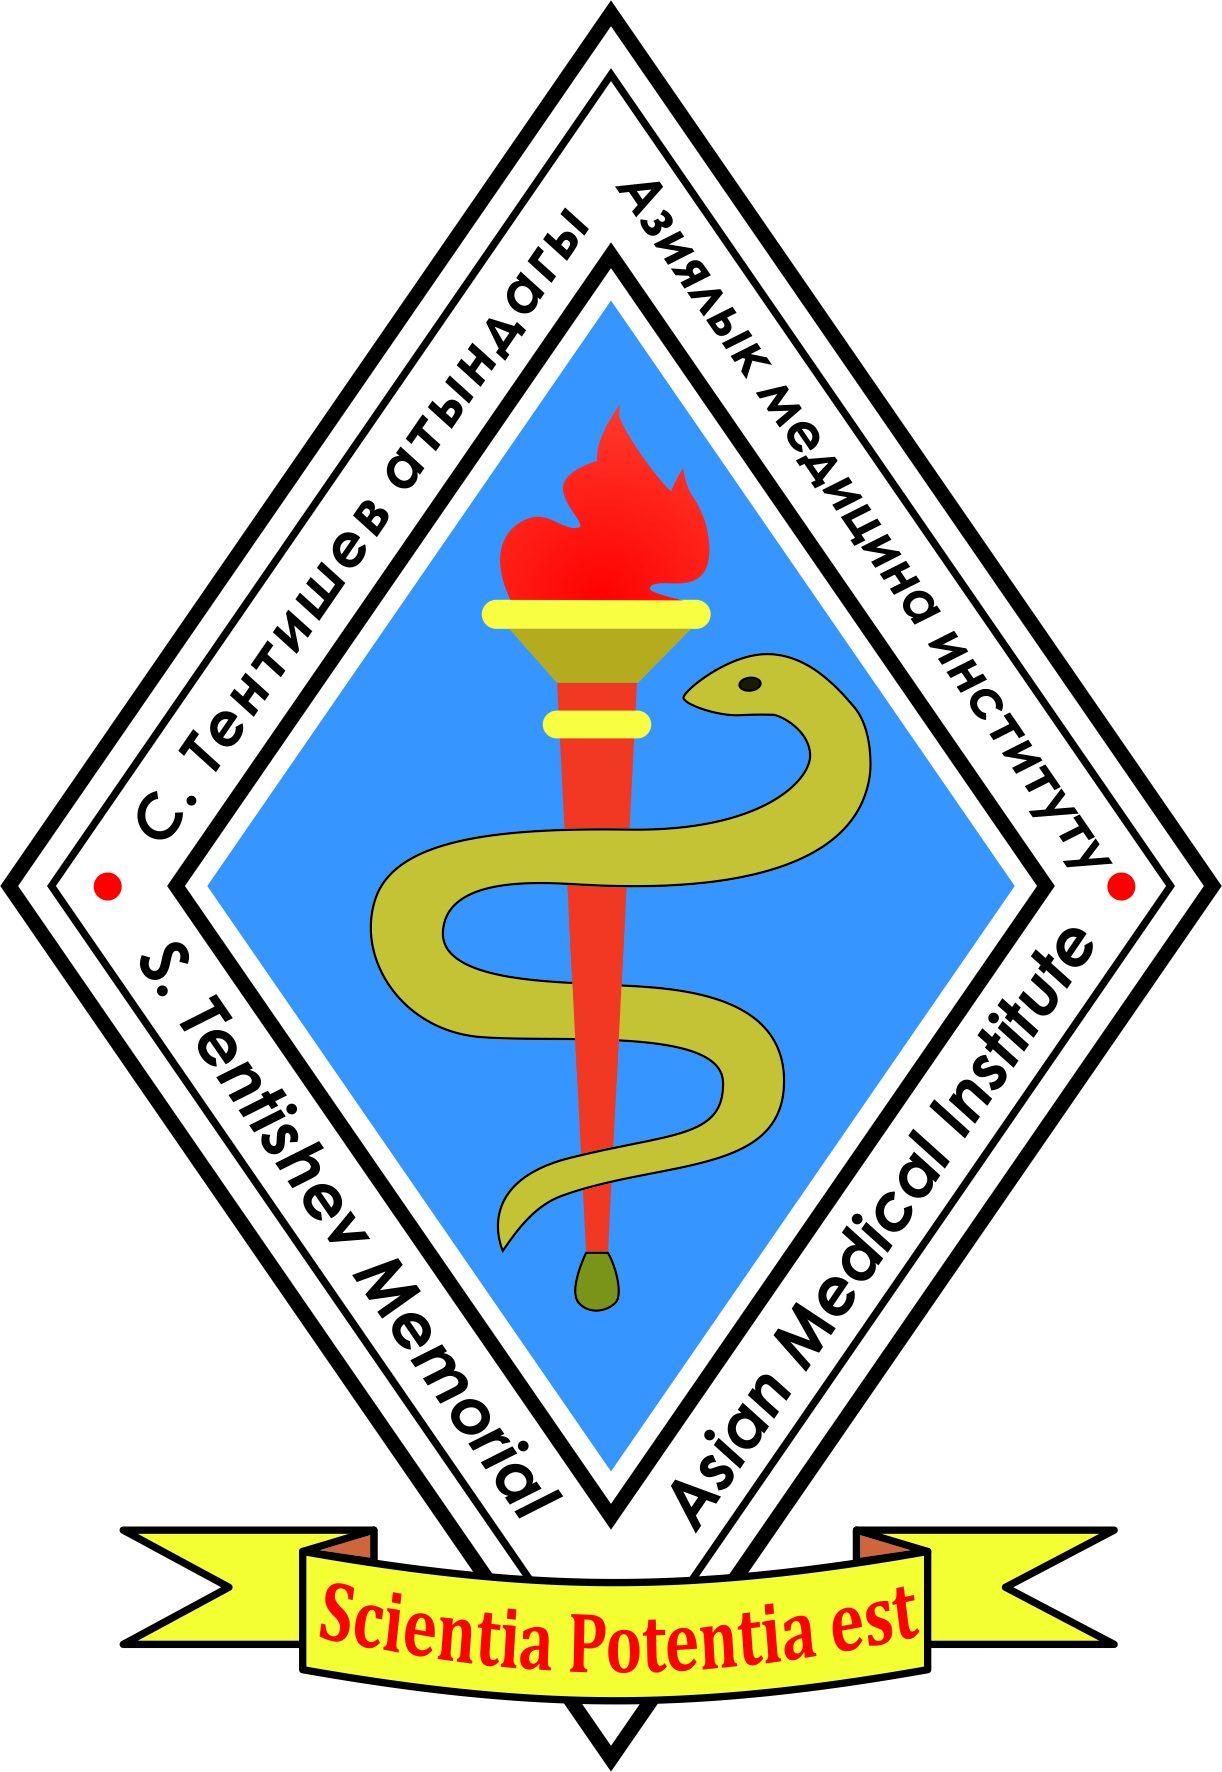 Азиатский медицинский институт имени Саткынбая Тентишева